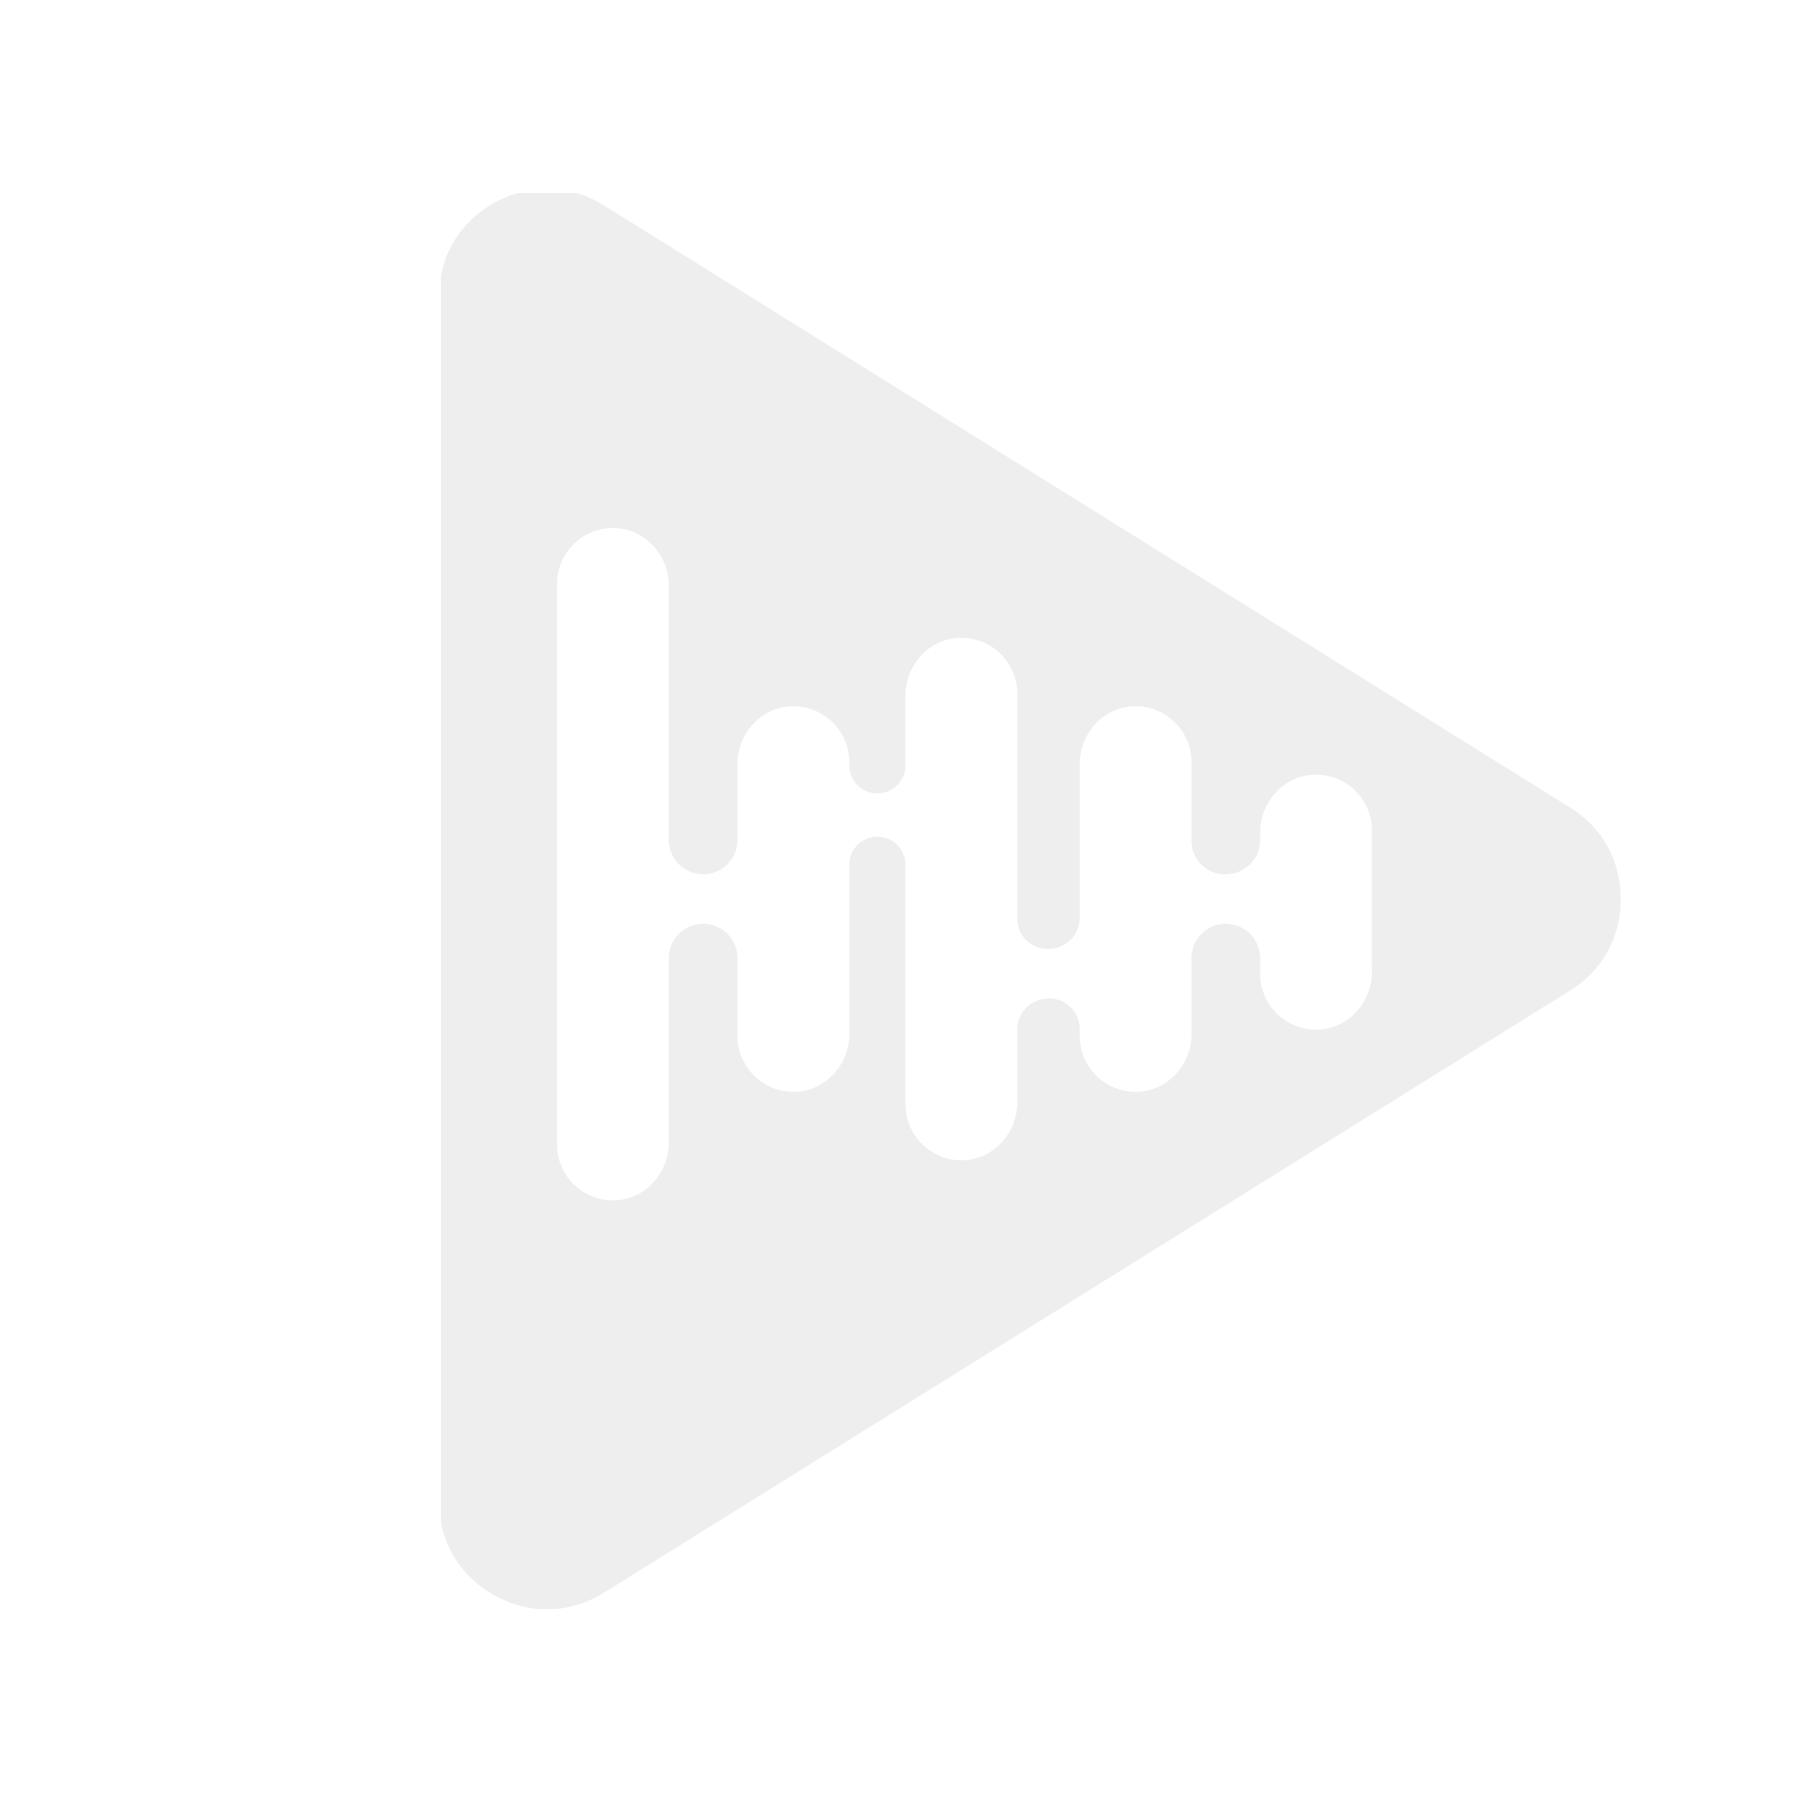 Oehlbach MMT-C AUDIO - PRO IN AUDIO phono-innsats, 2x RCA for RCA-kontakt